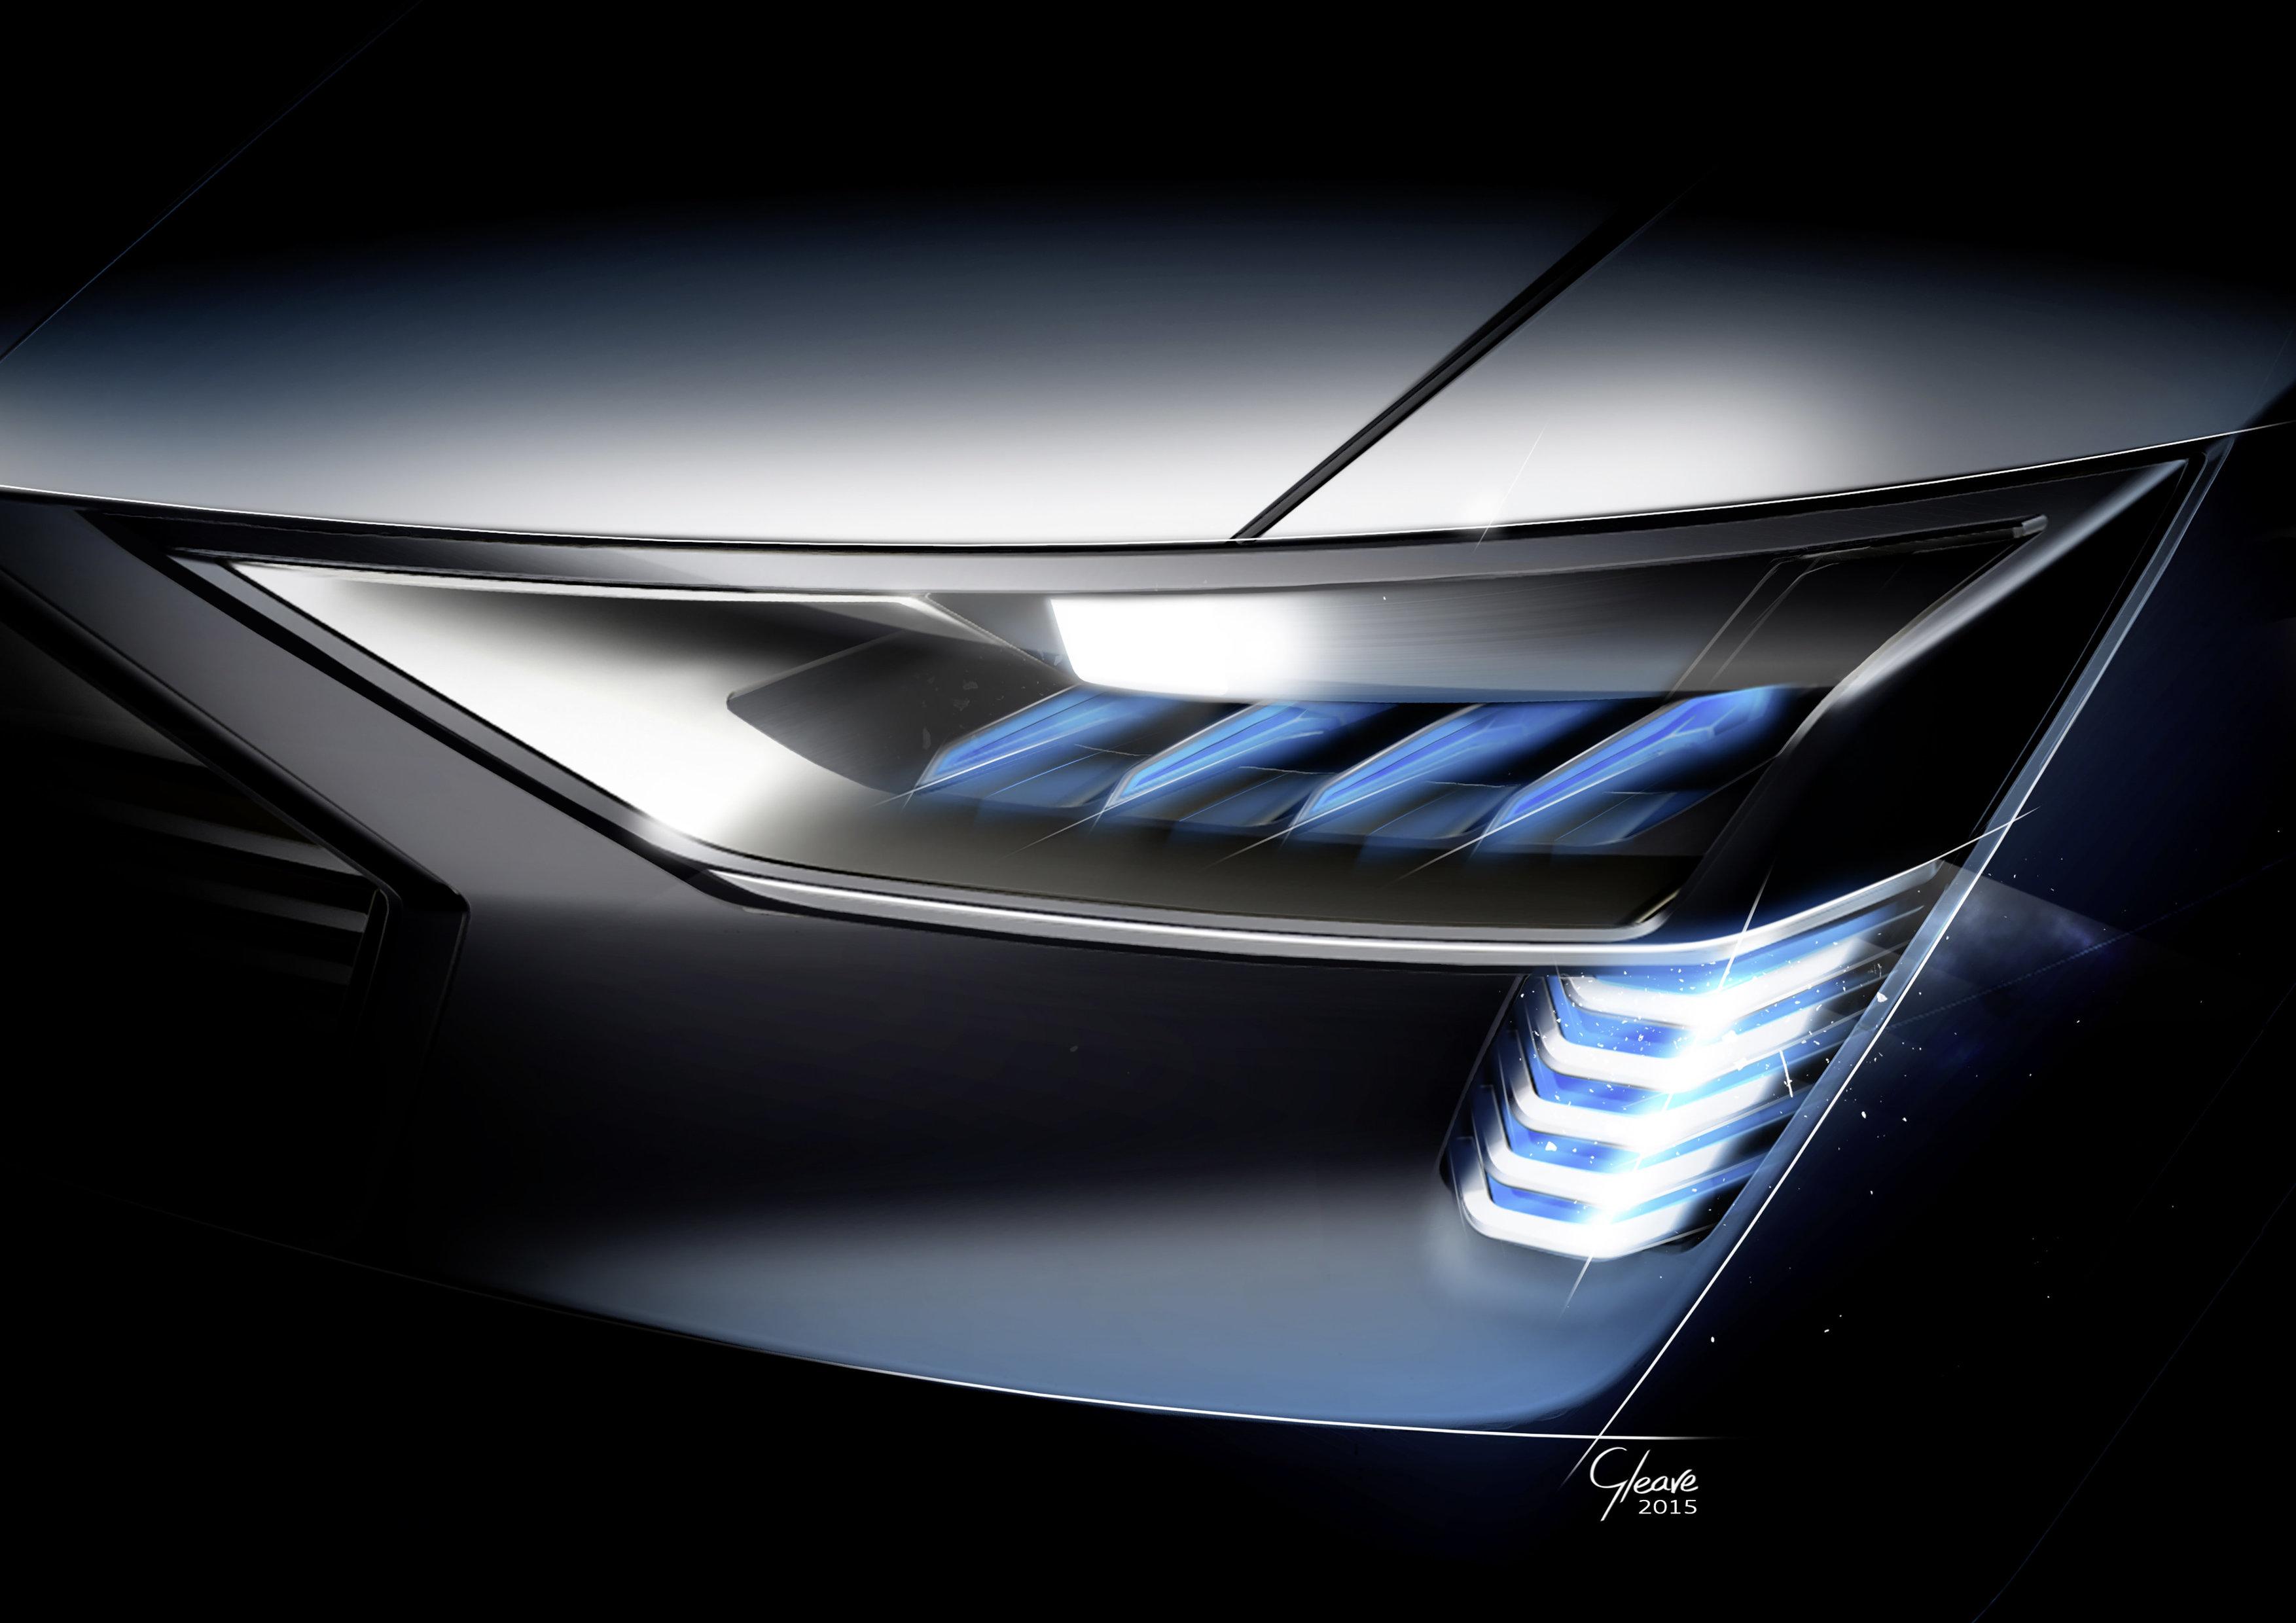 Audi e-tron quattro concept â?? Headlight with e-tron light sign